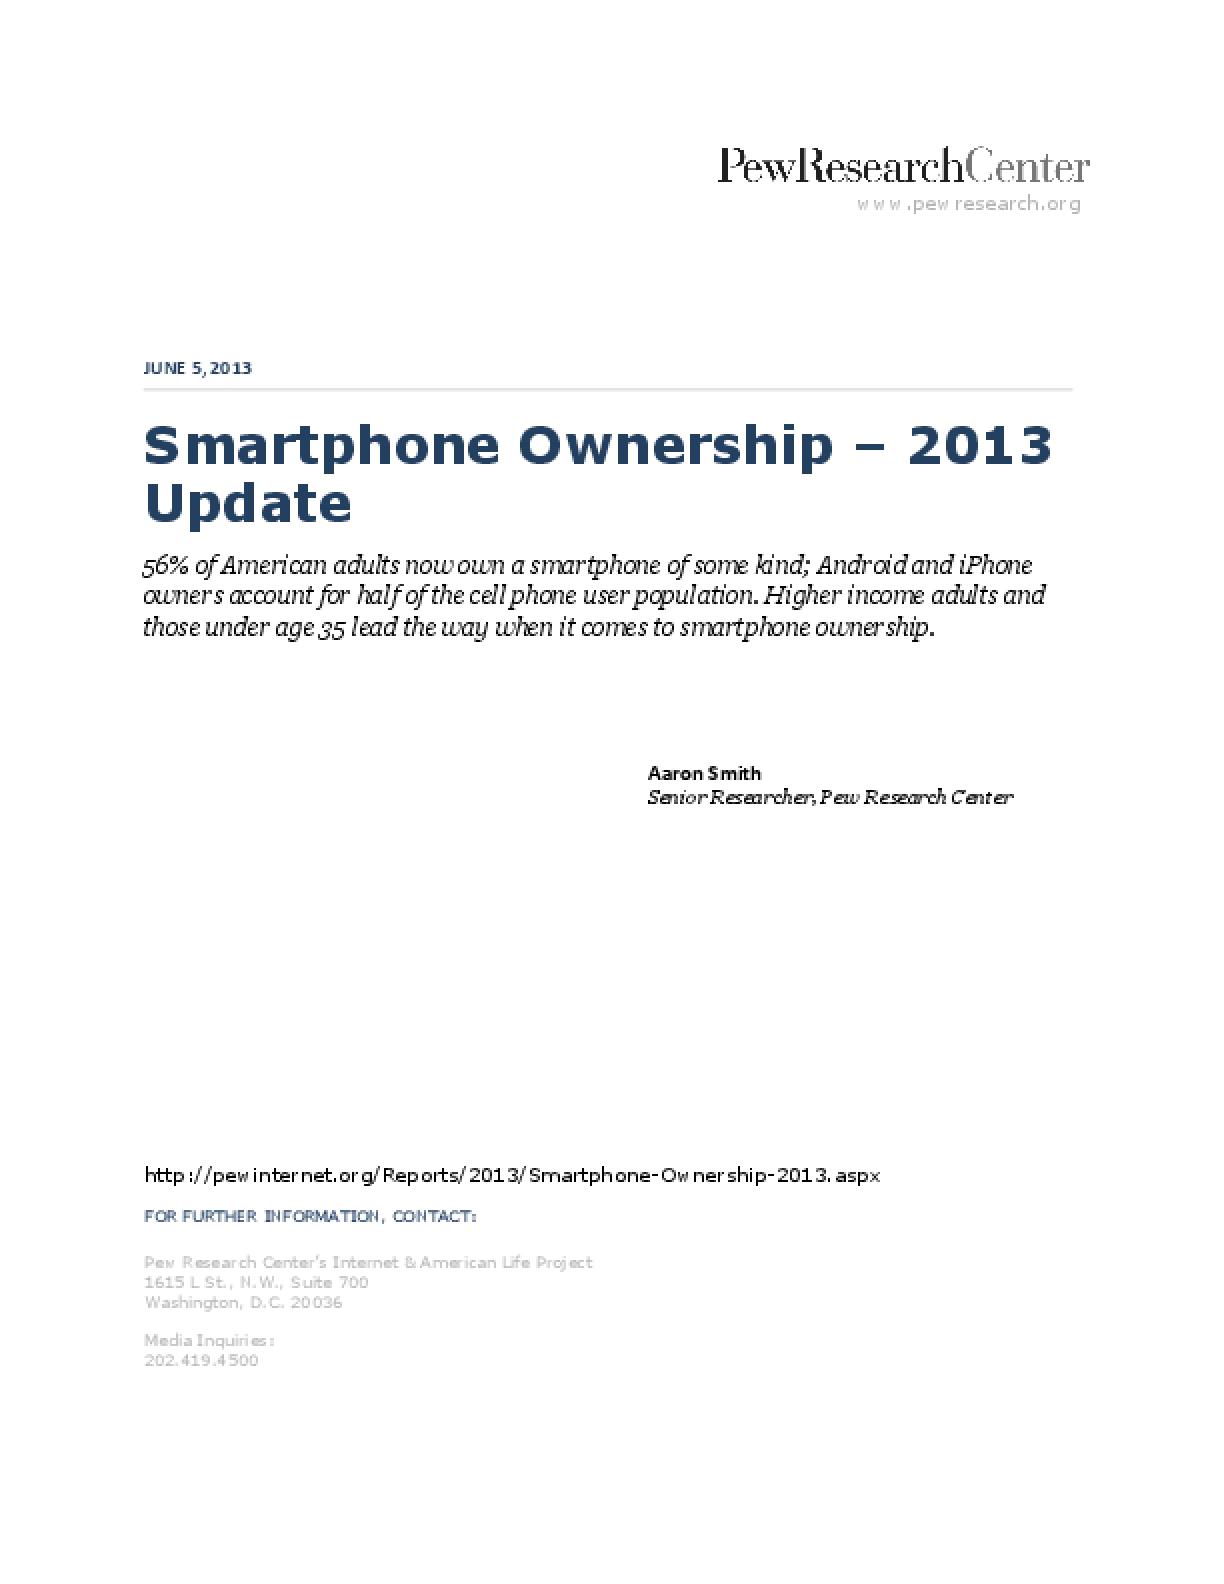 Smartphone Ownership - 2013 Update